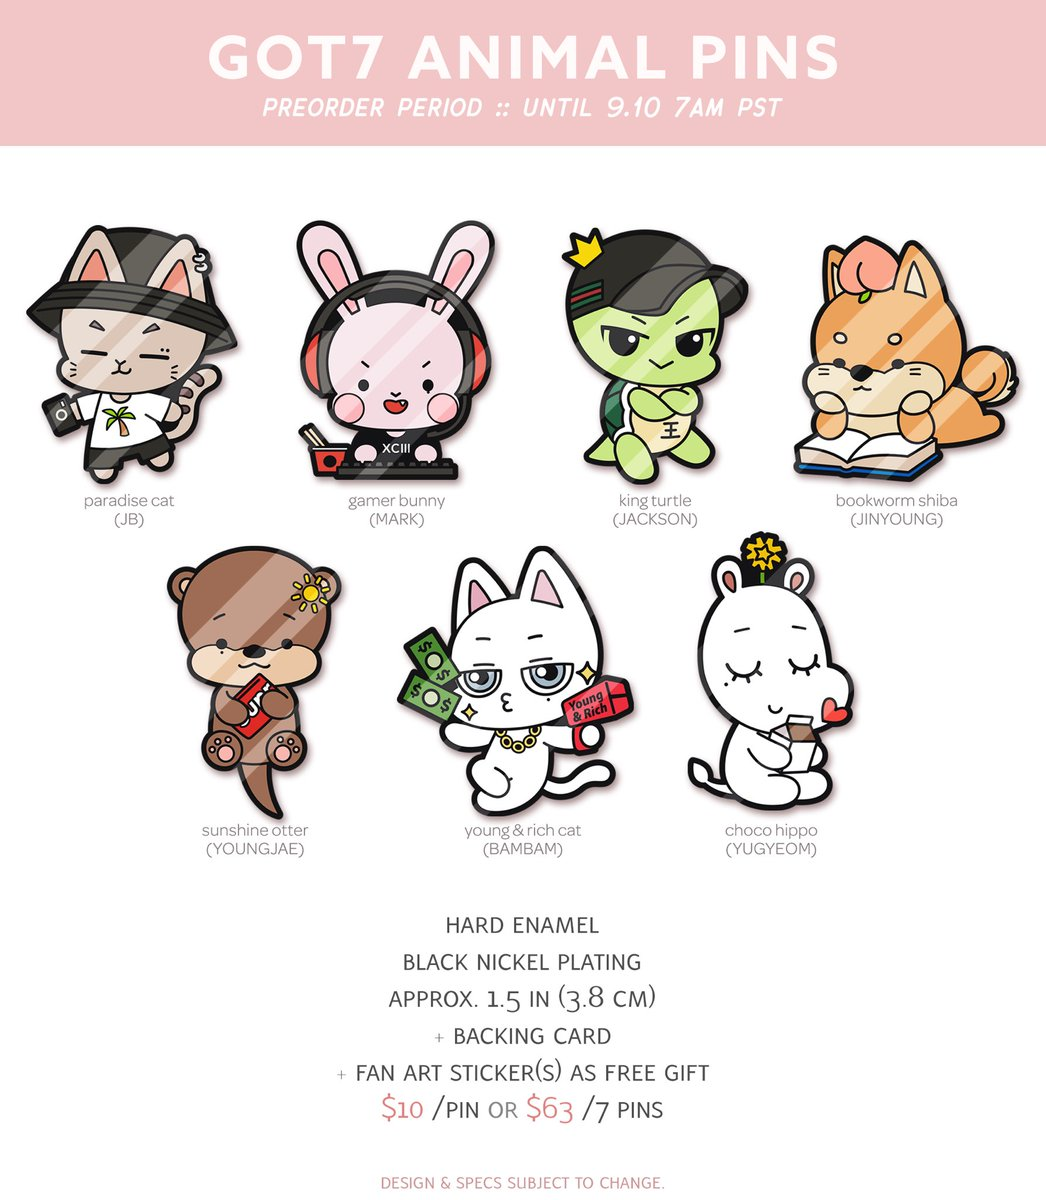 Kpop Got7 Jackson Wang Fanart Postcard Post Cards Sticker Artbook Gift Cosplay Props Book Set Collection Novelty & Special Use